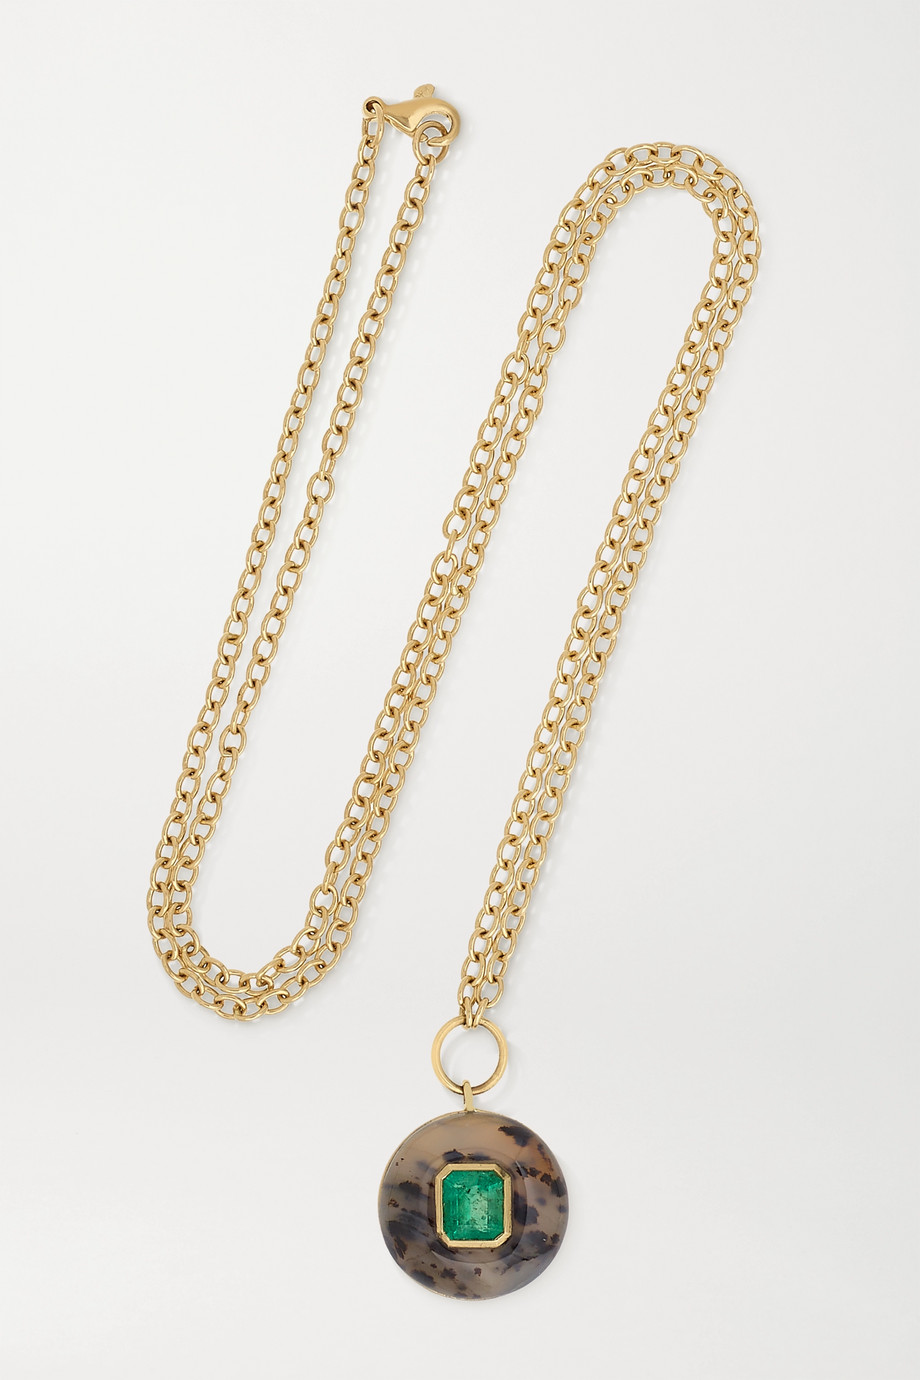 Retrouvaí Lollipop 14-karat gold, dendrite and emerald necklace